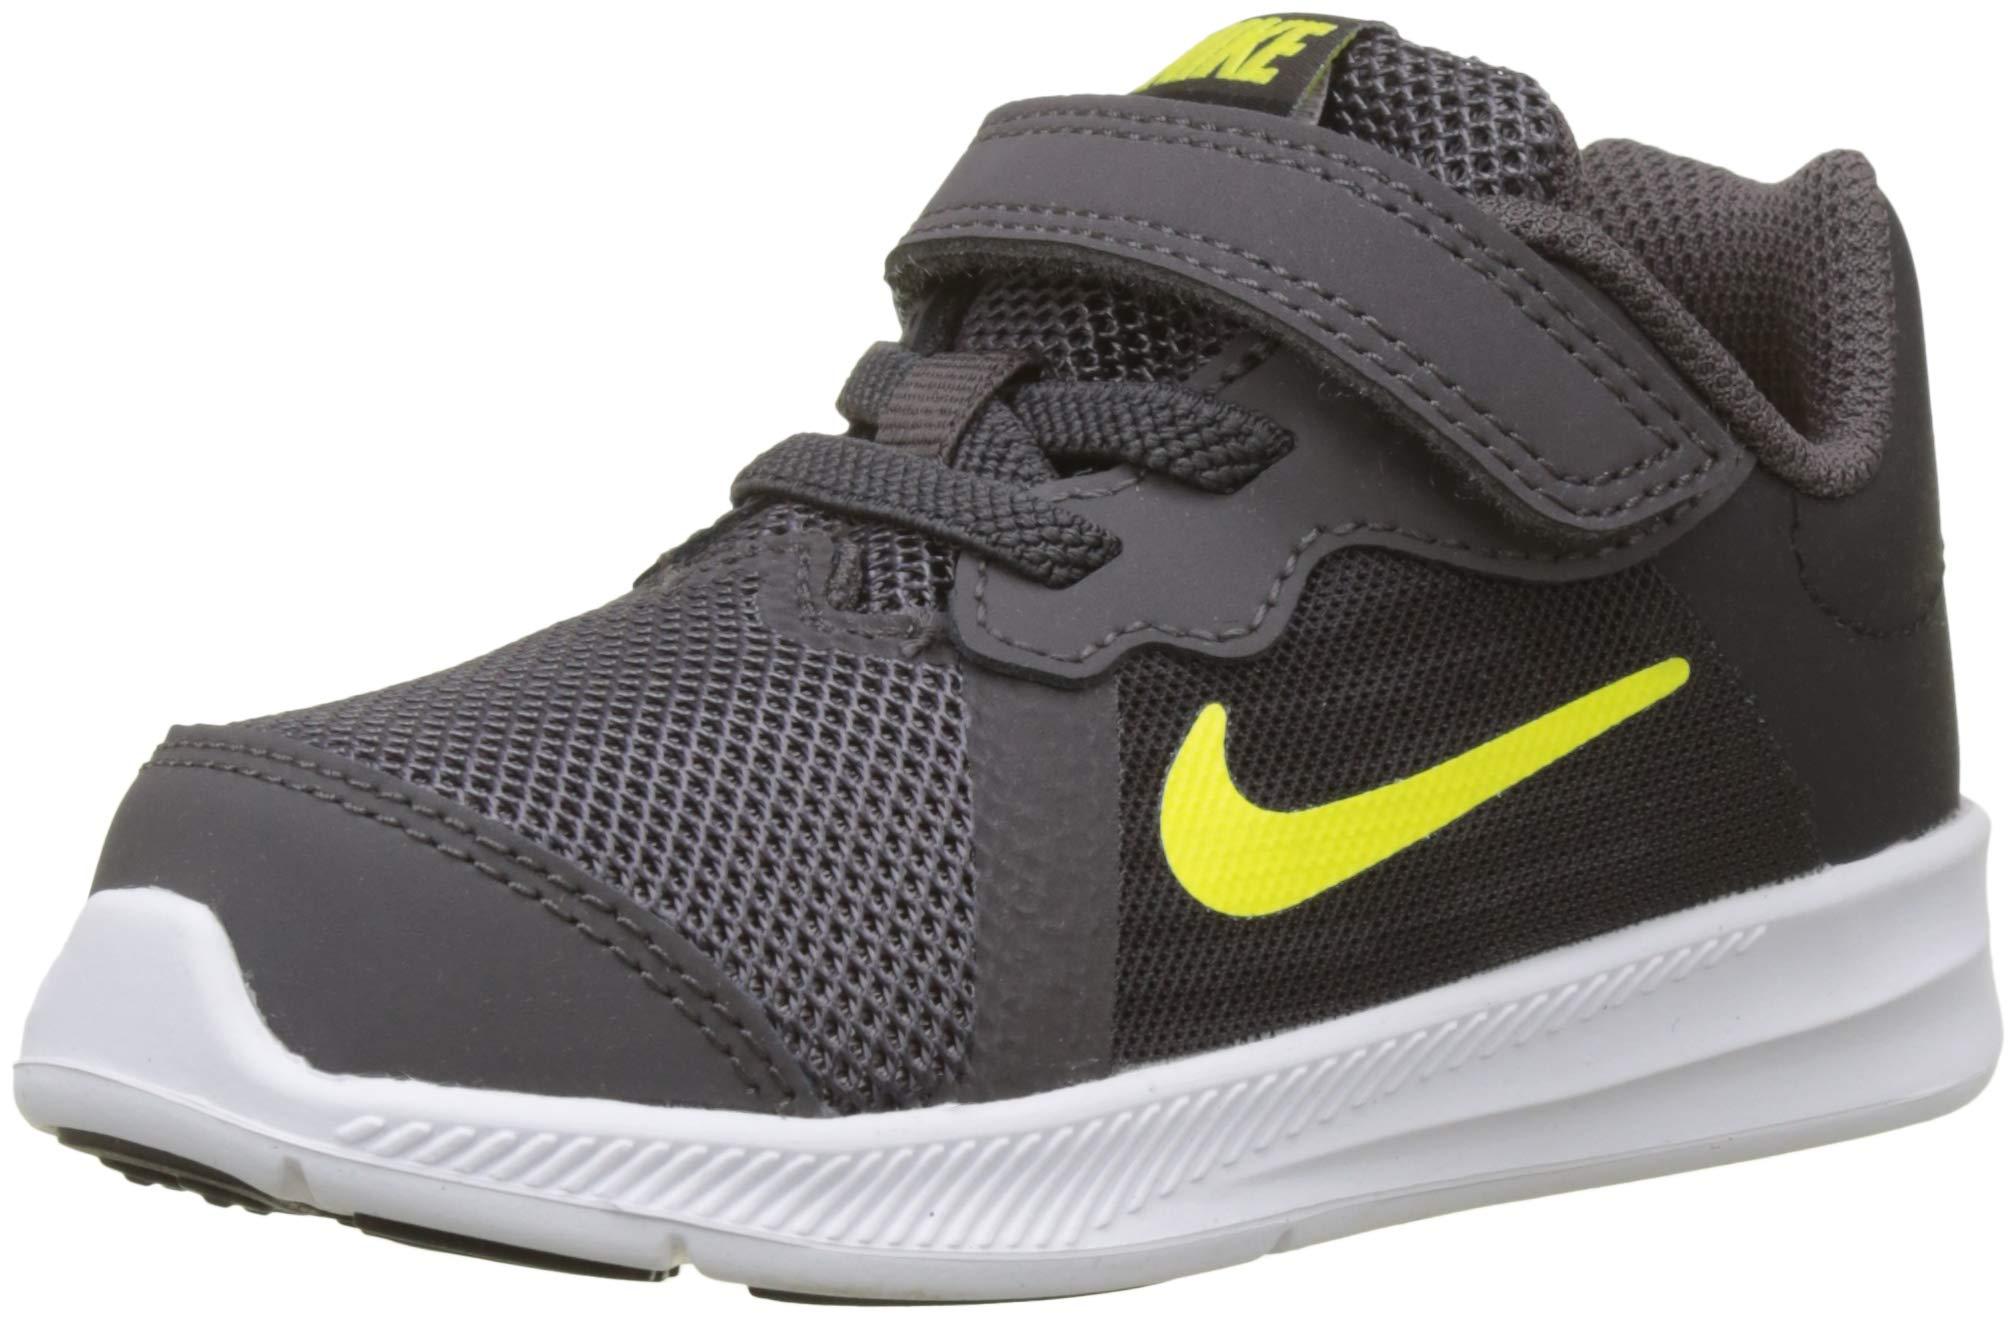 Girls Scarpe Nike Running 8 Like R6axwx Downshifter Bambino You Tdv qaTxAw6Ra